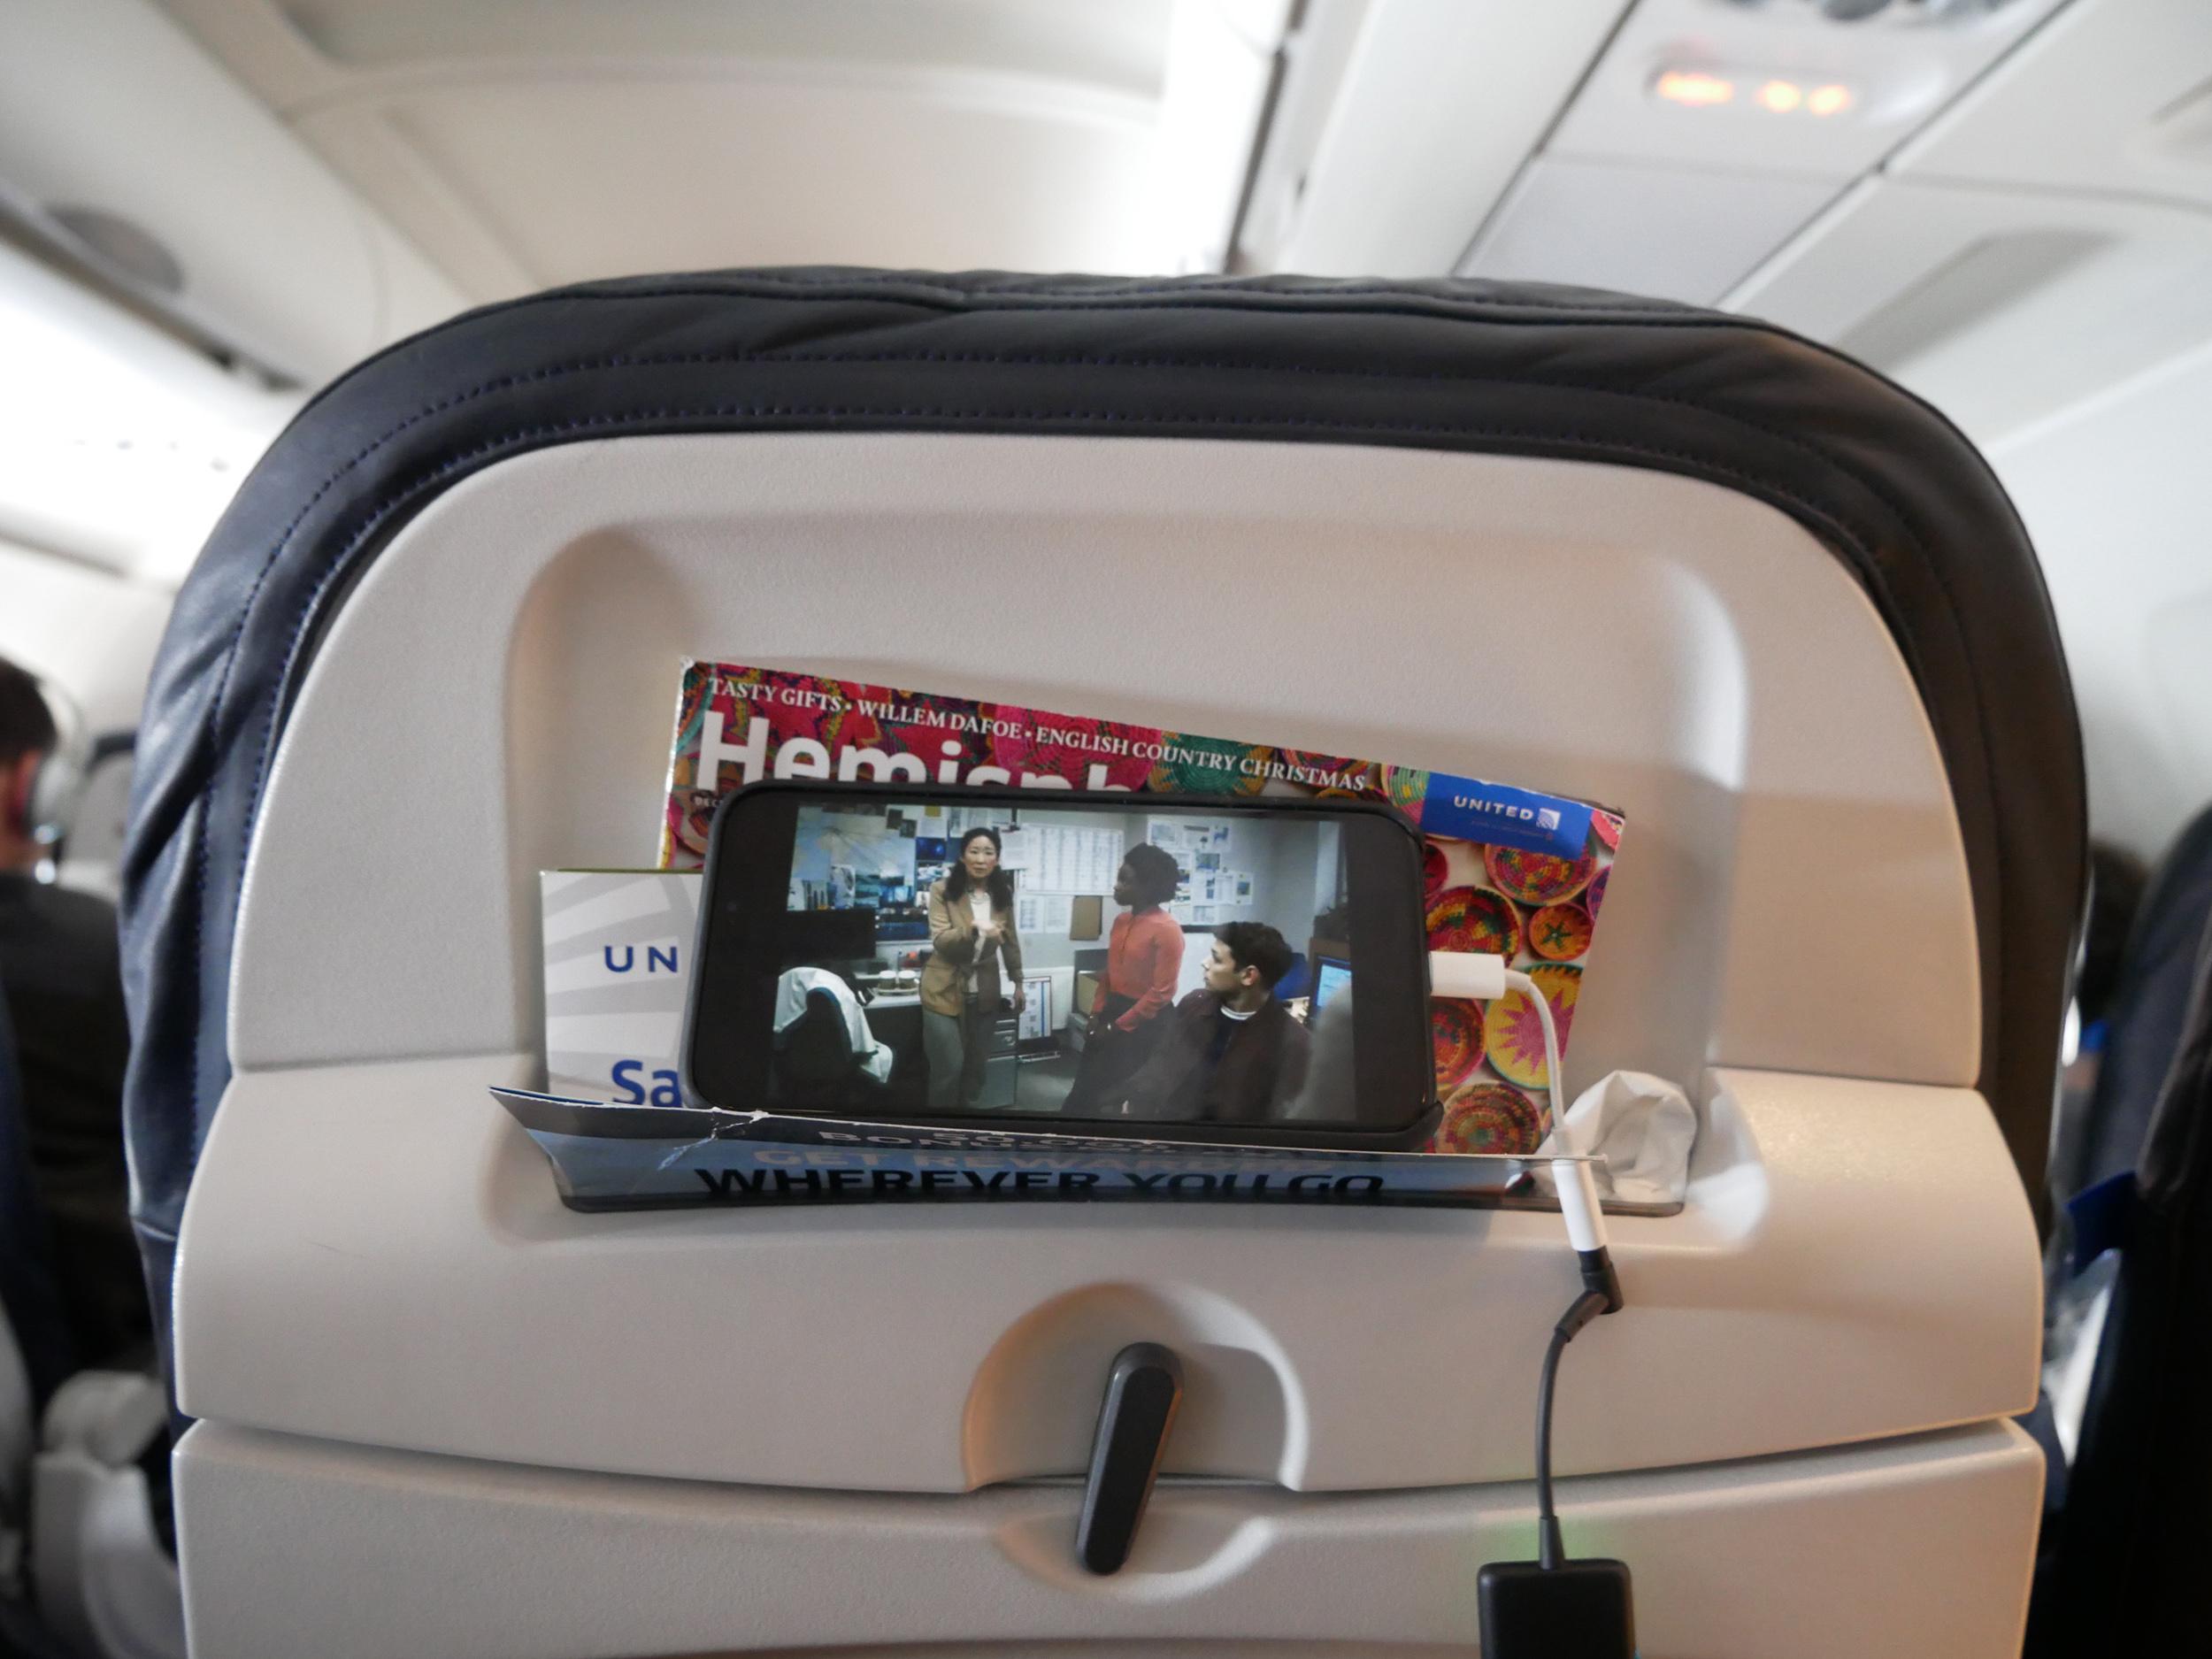 airplane seat back phone holder.jpg